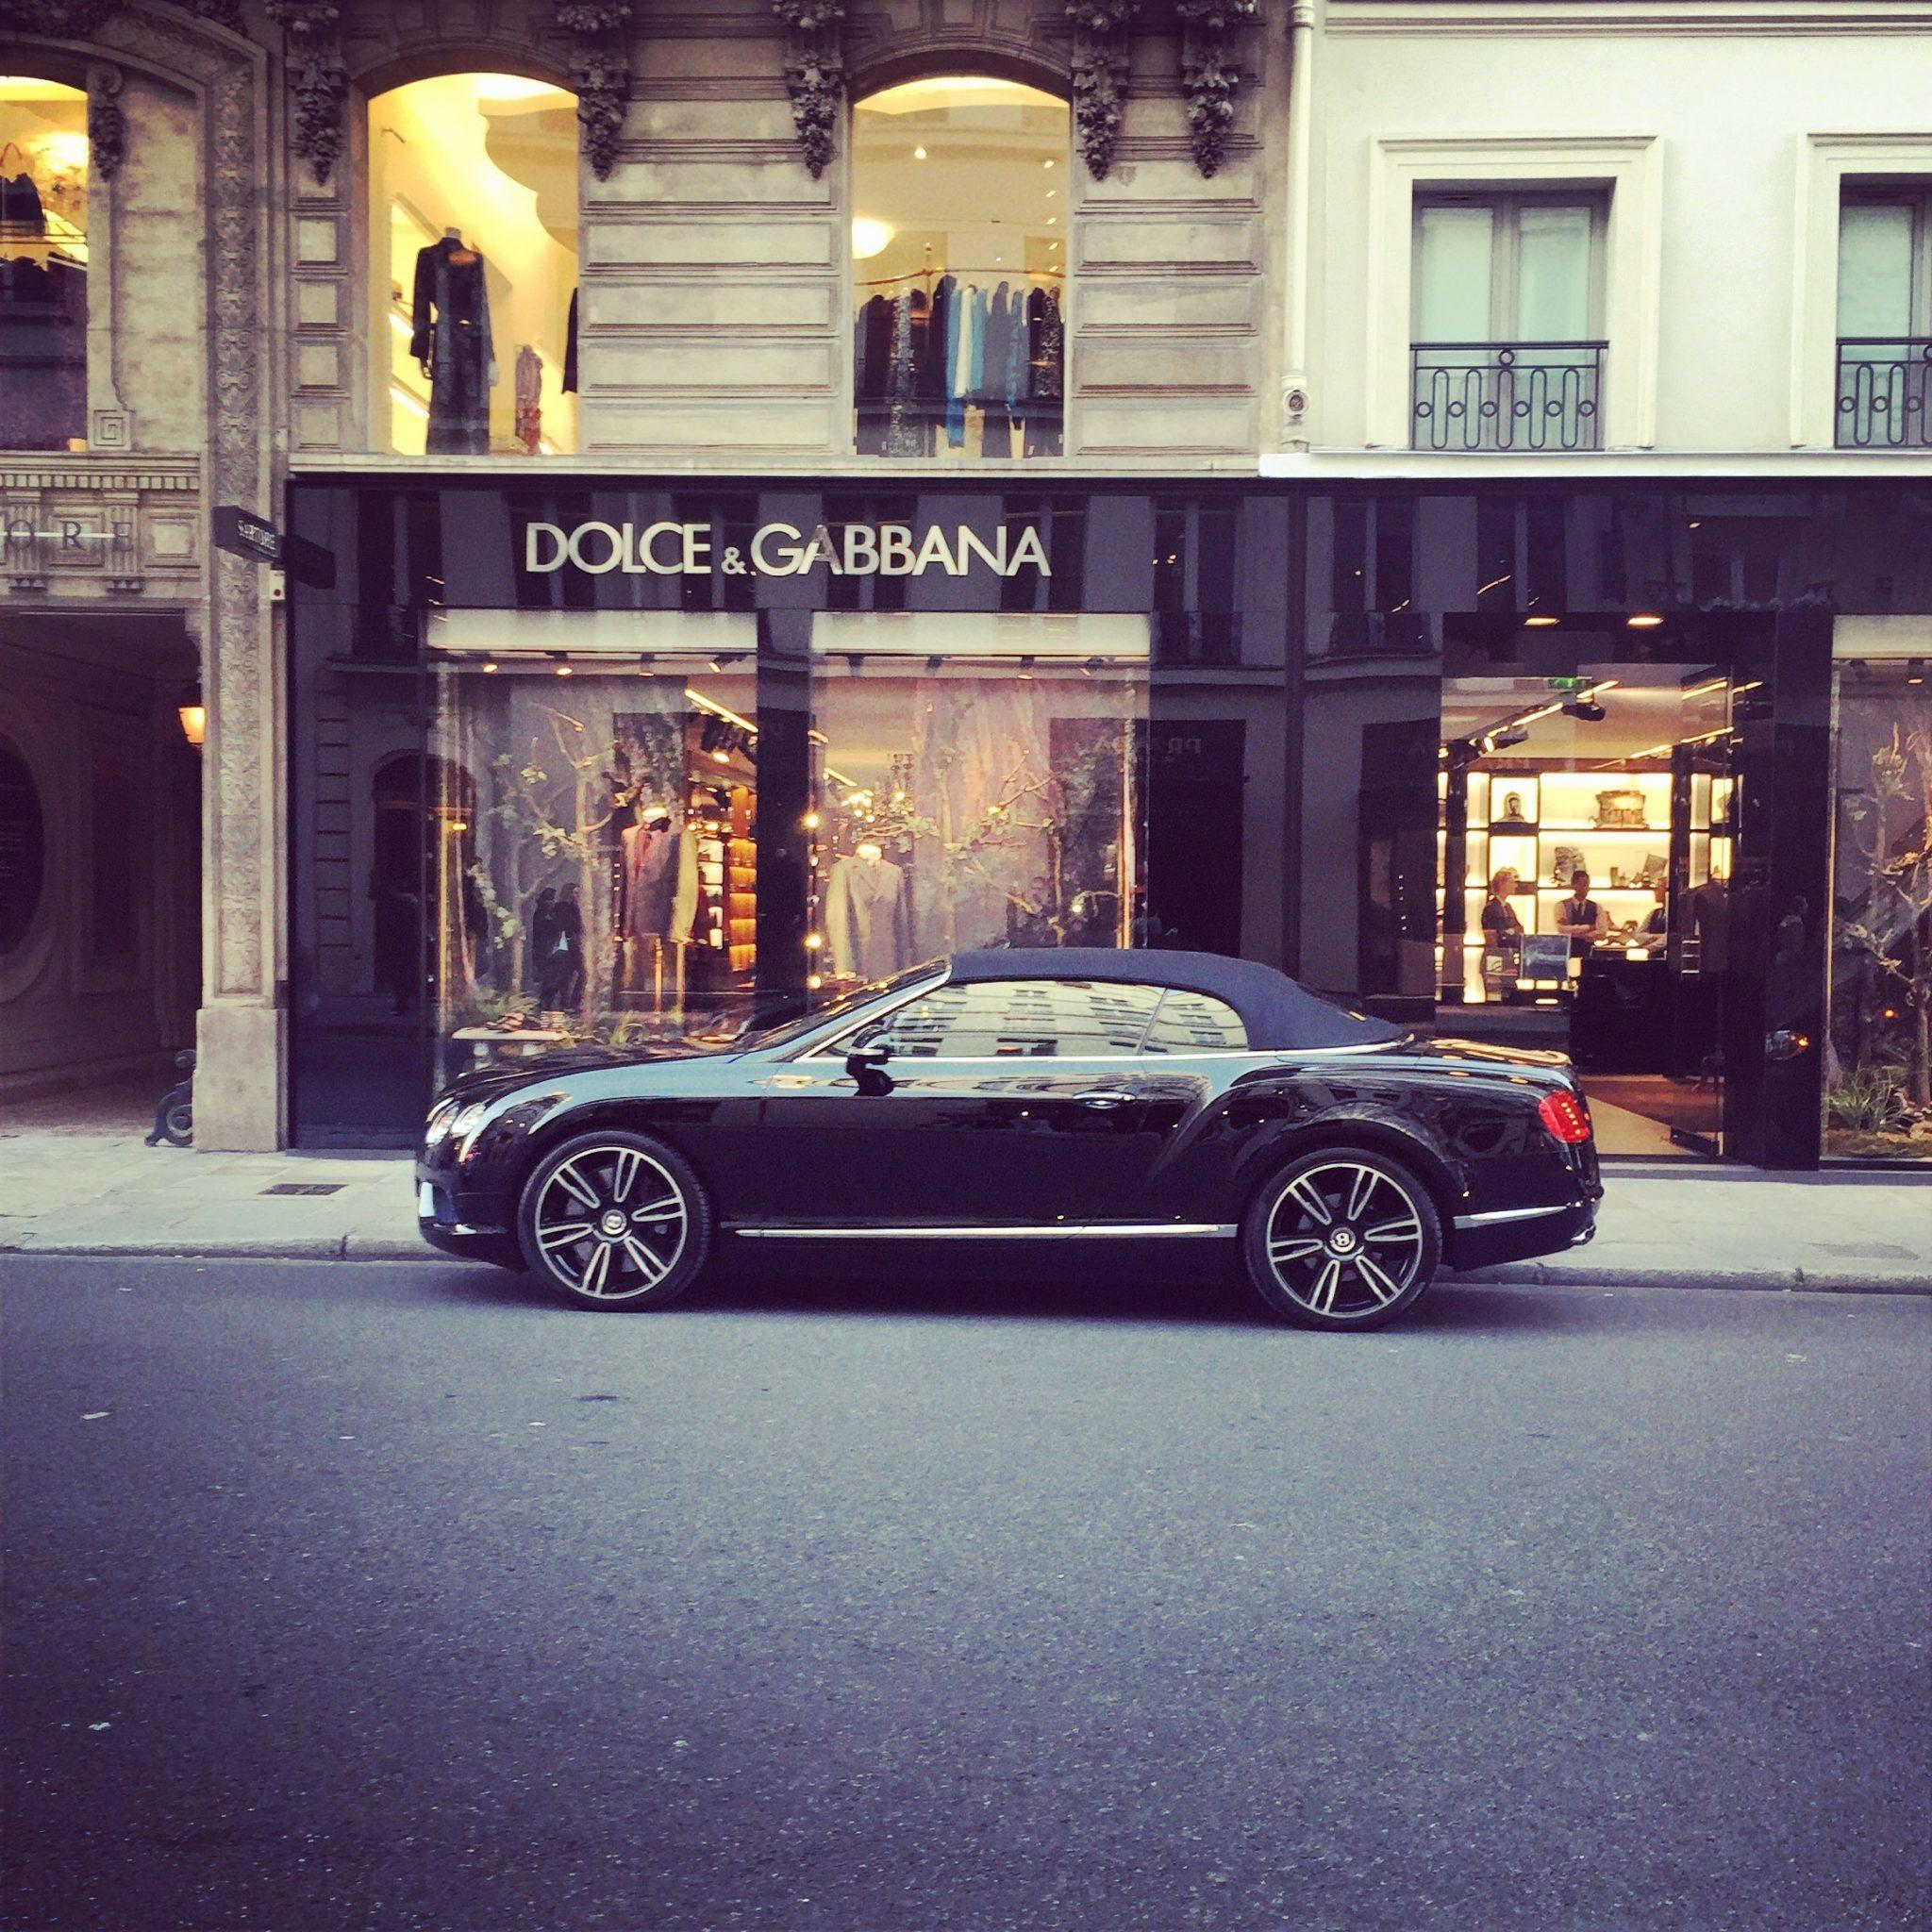 Dolce & Gabbana Paris